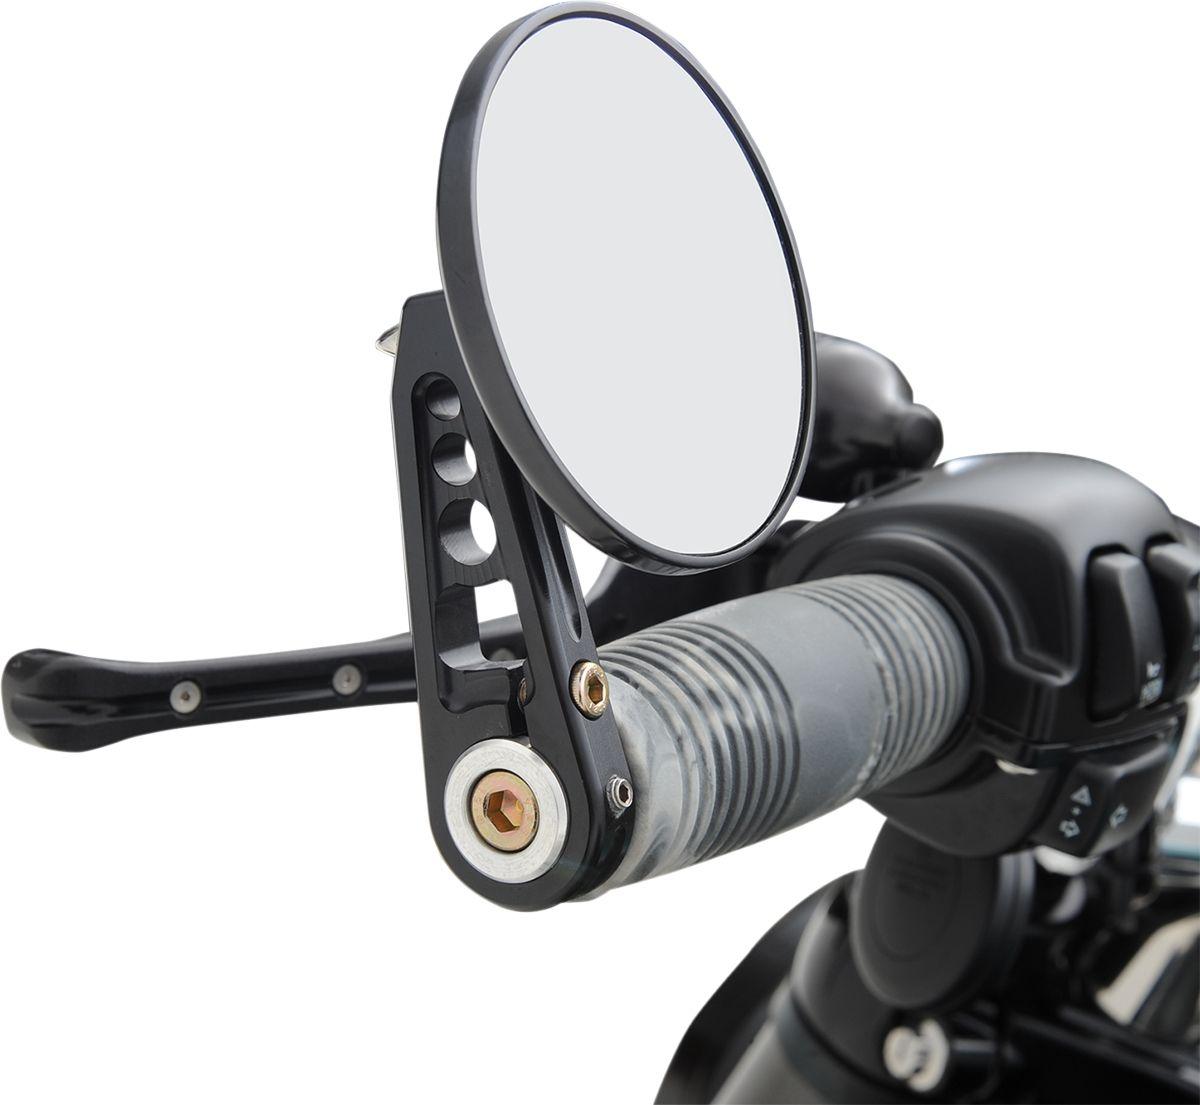 【JOKER MACHINE】把手末端後視鏡直鏡桿 3 1/4  黑色 【MIRROR3 1/4BRND STEMD BLK [0640-0608]】 - 「Webike-摩托百貨」